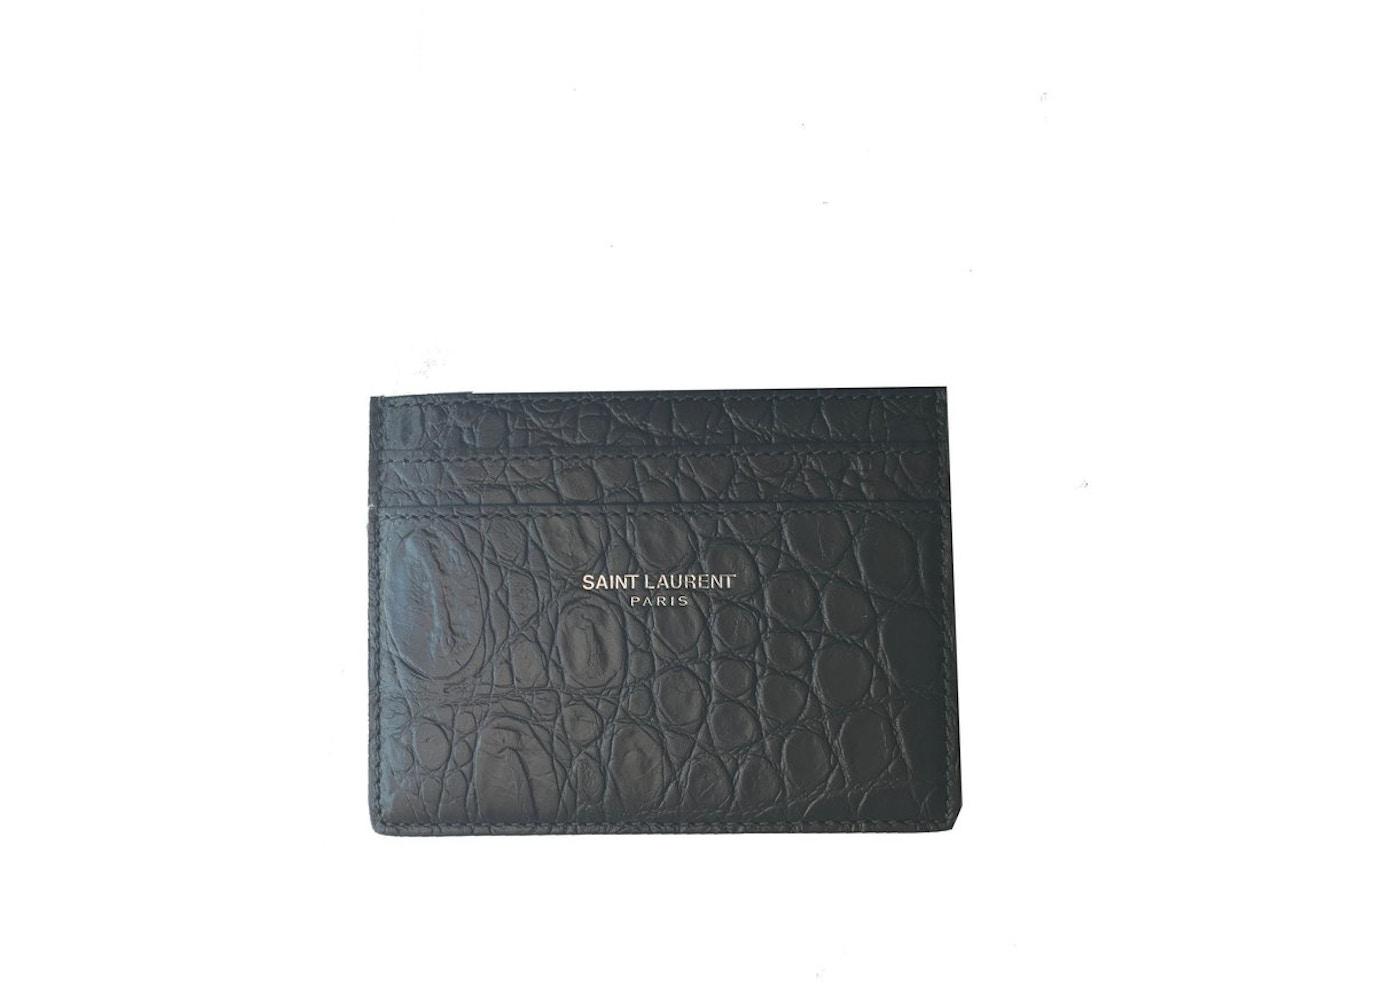 848755f0a74c Buy   Sell Saint Laurent Luxury Handbags